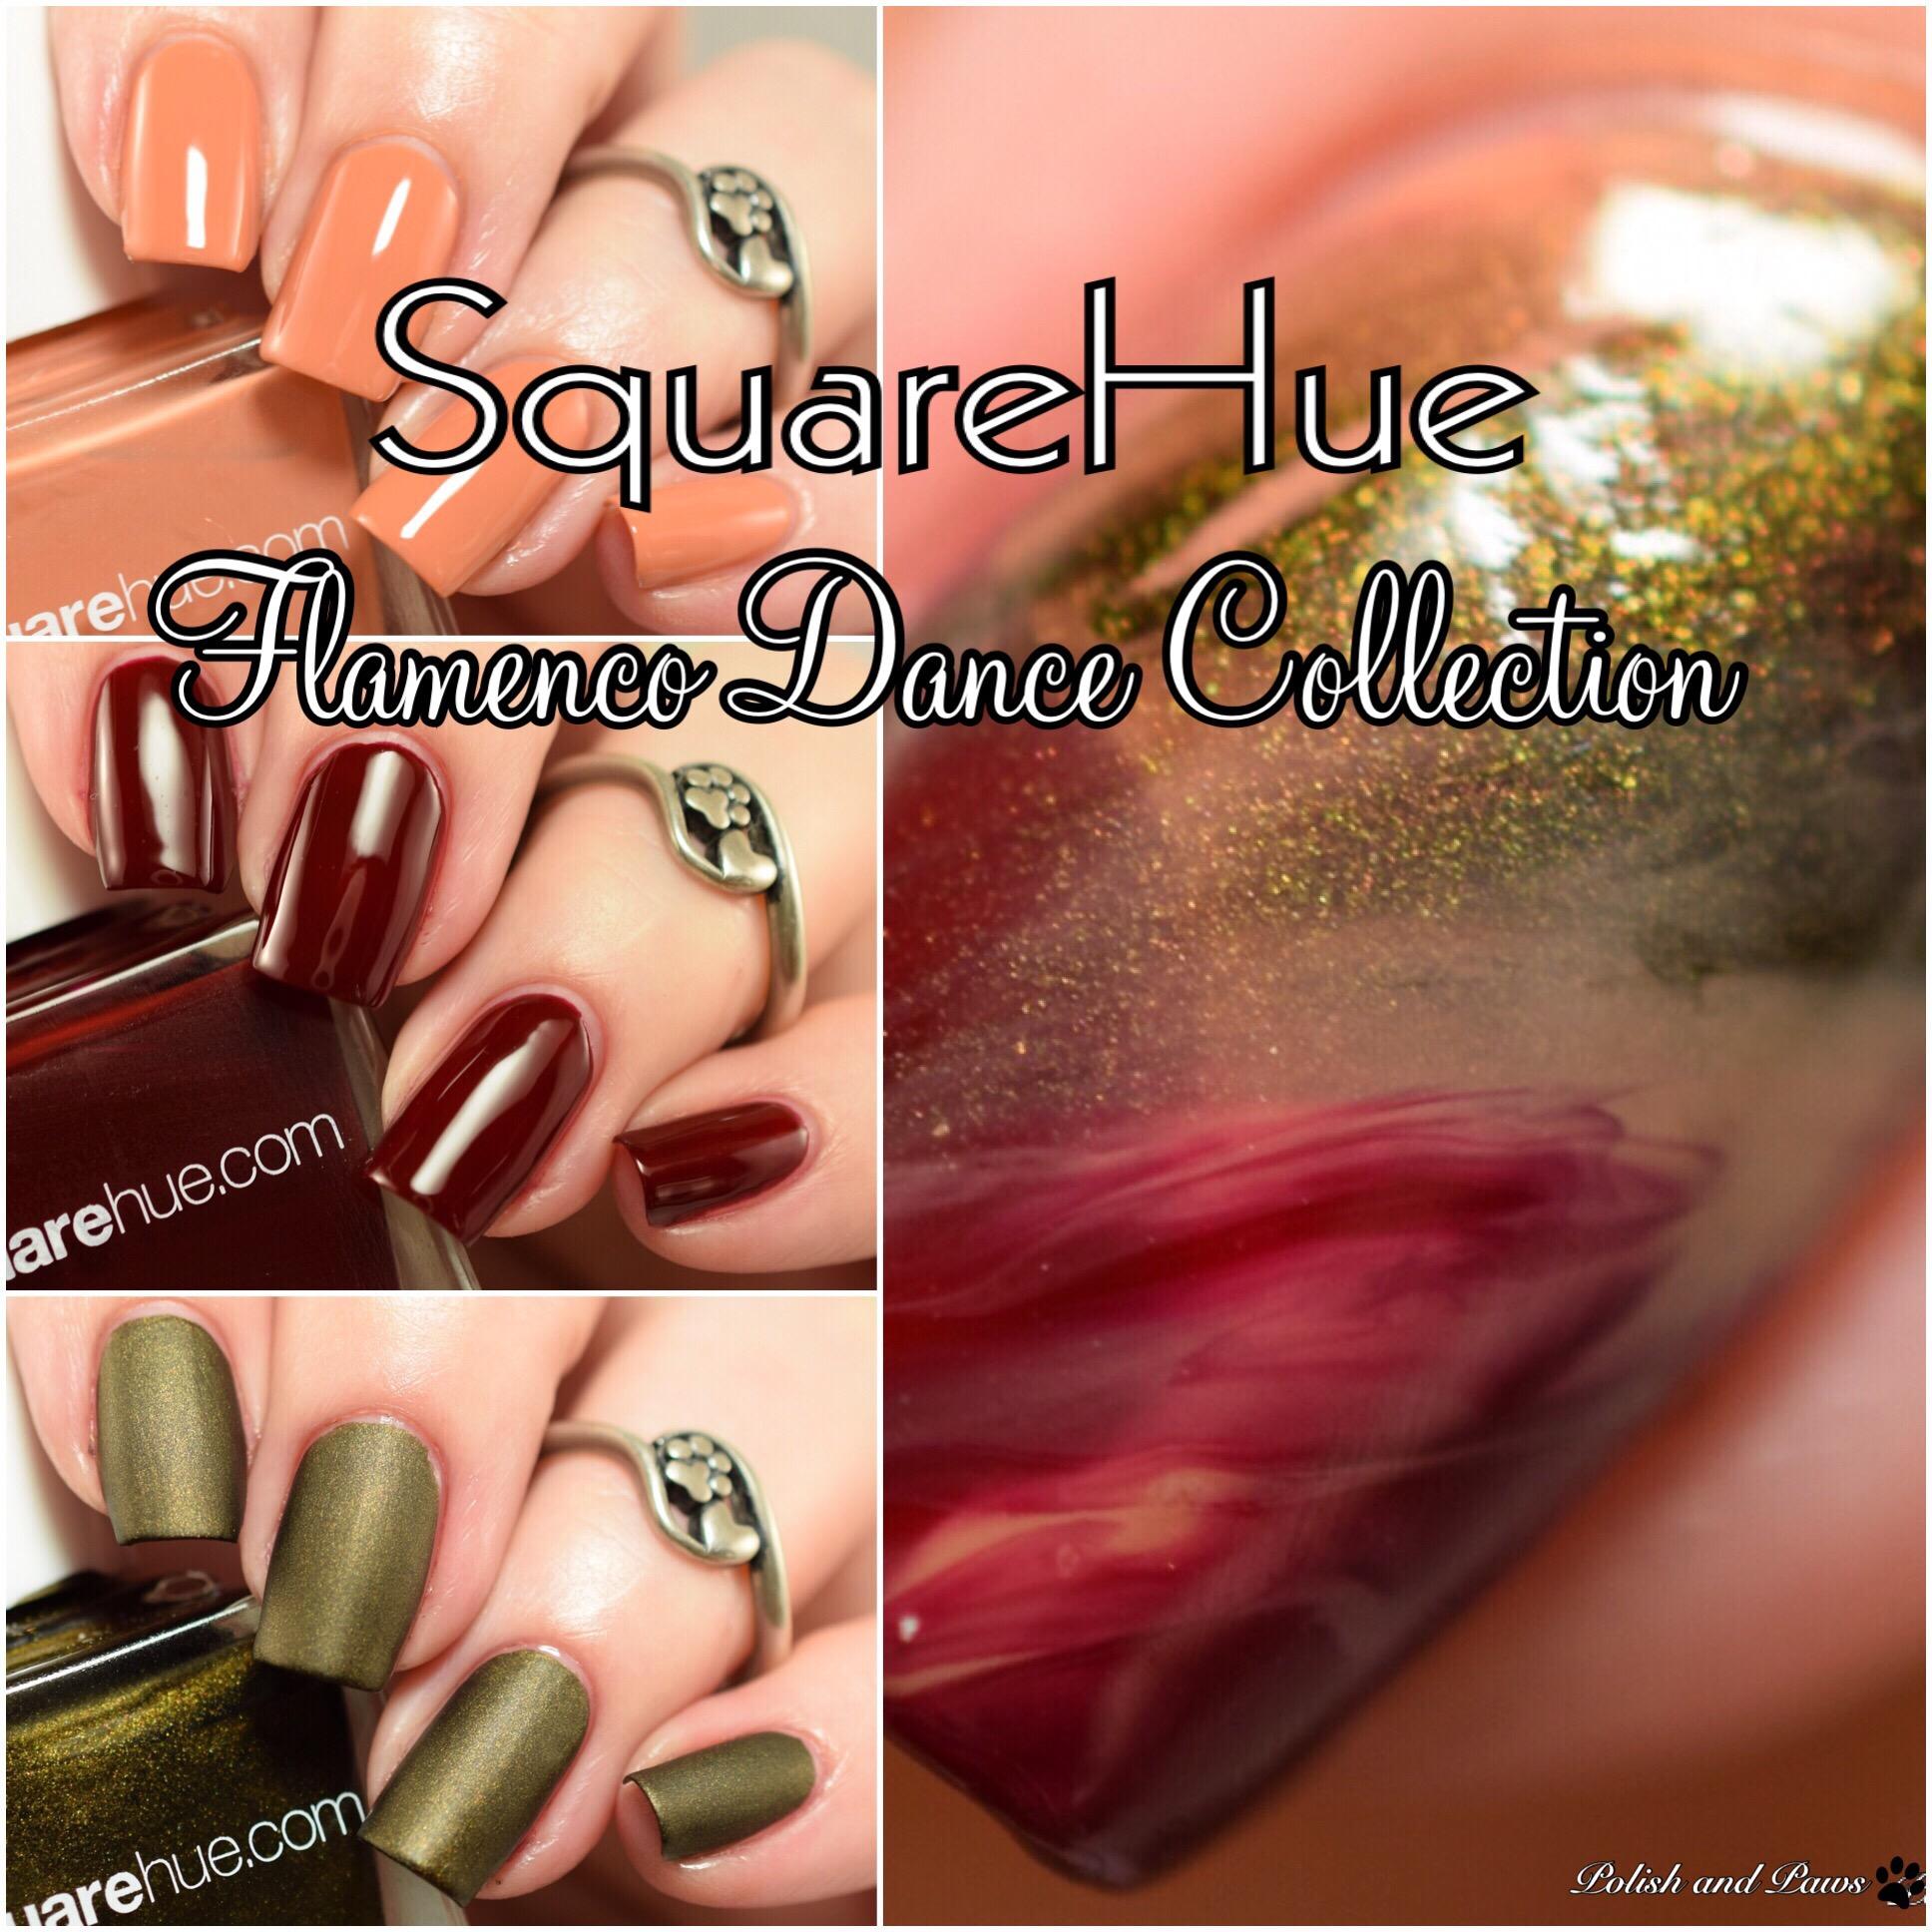 SquareHue Flamenco Dance Collection August 2017 Box